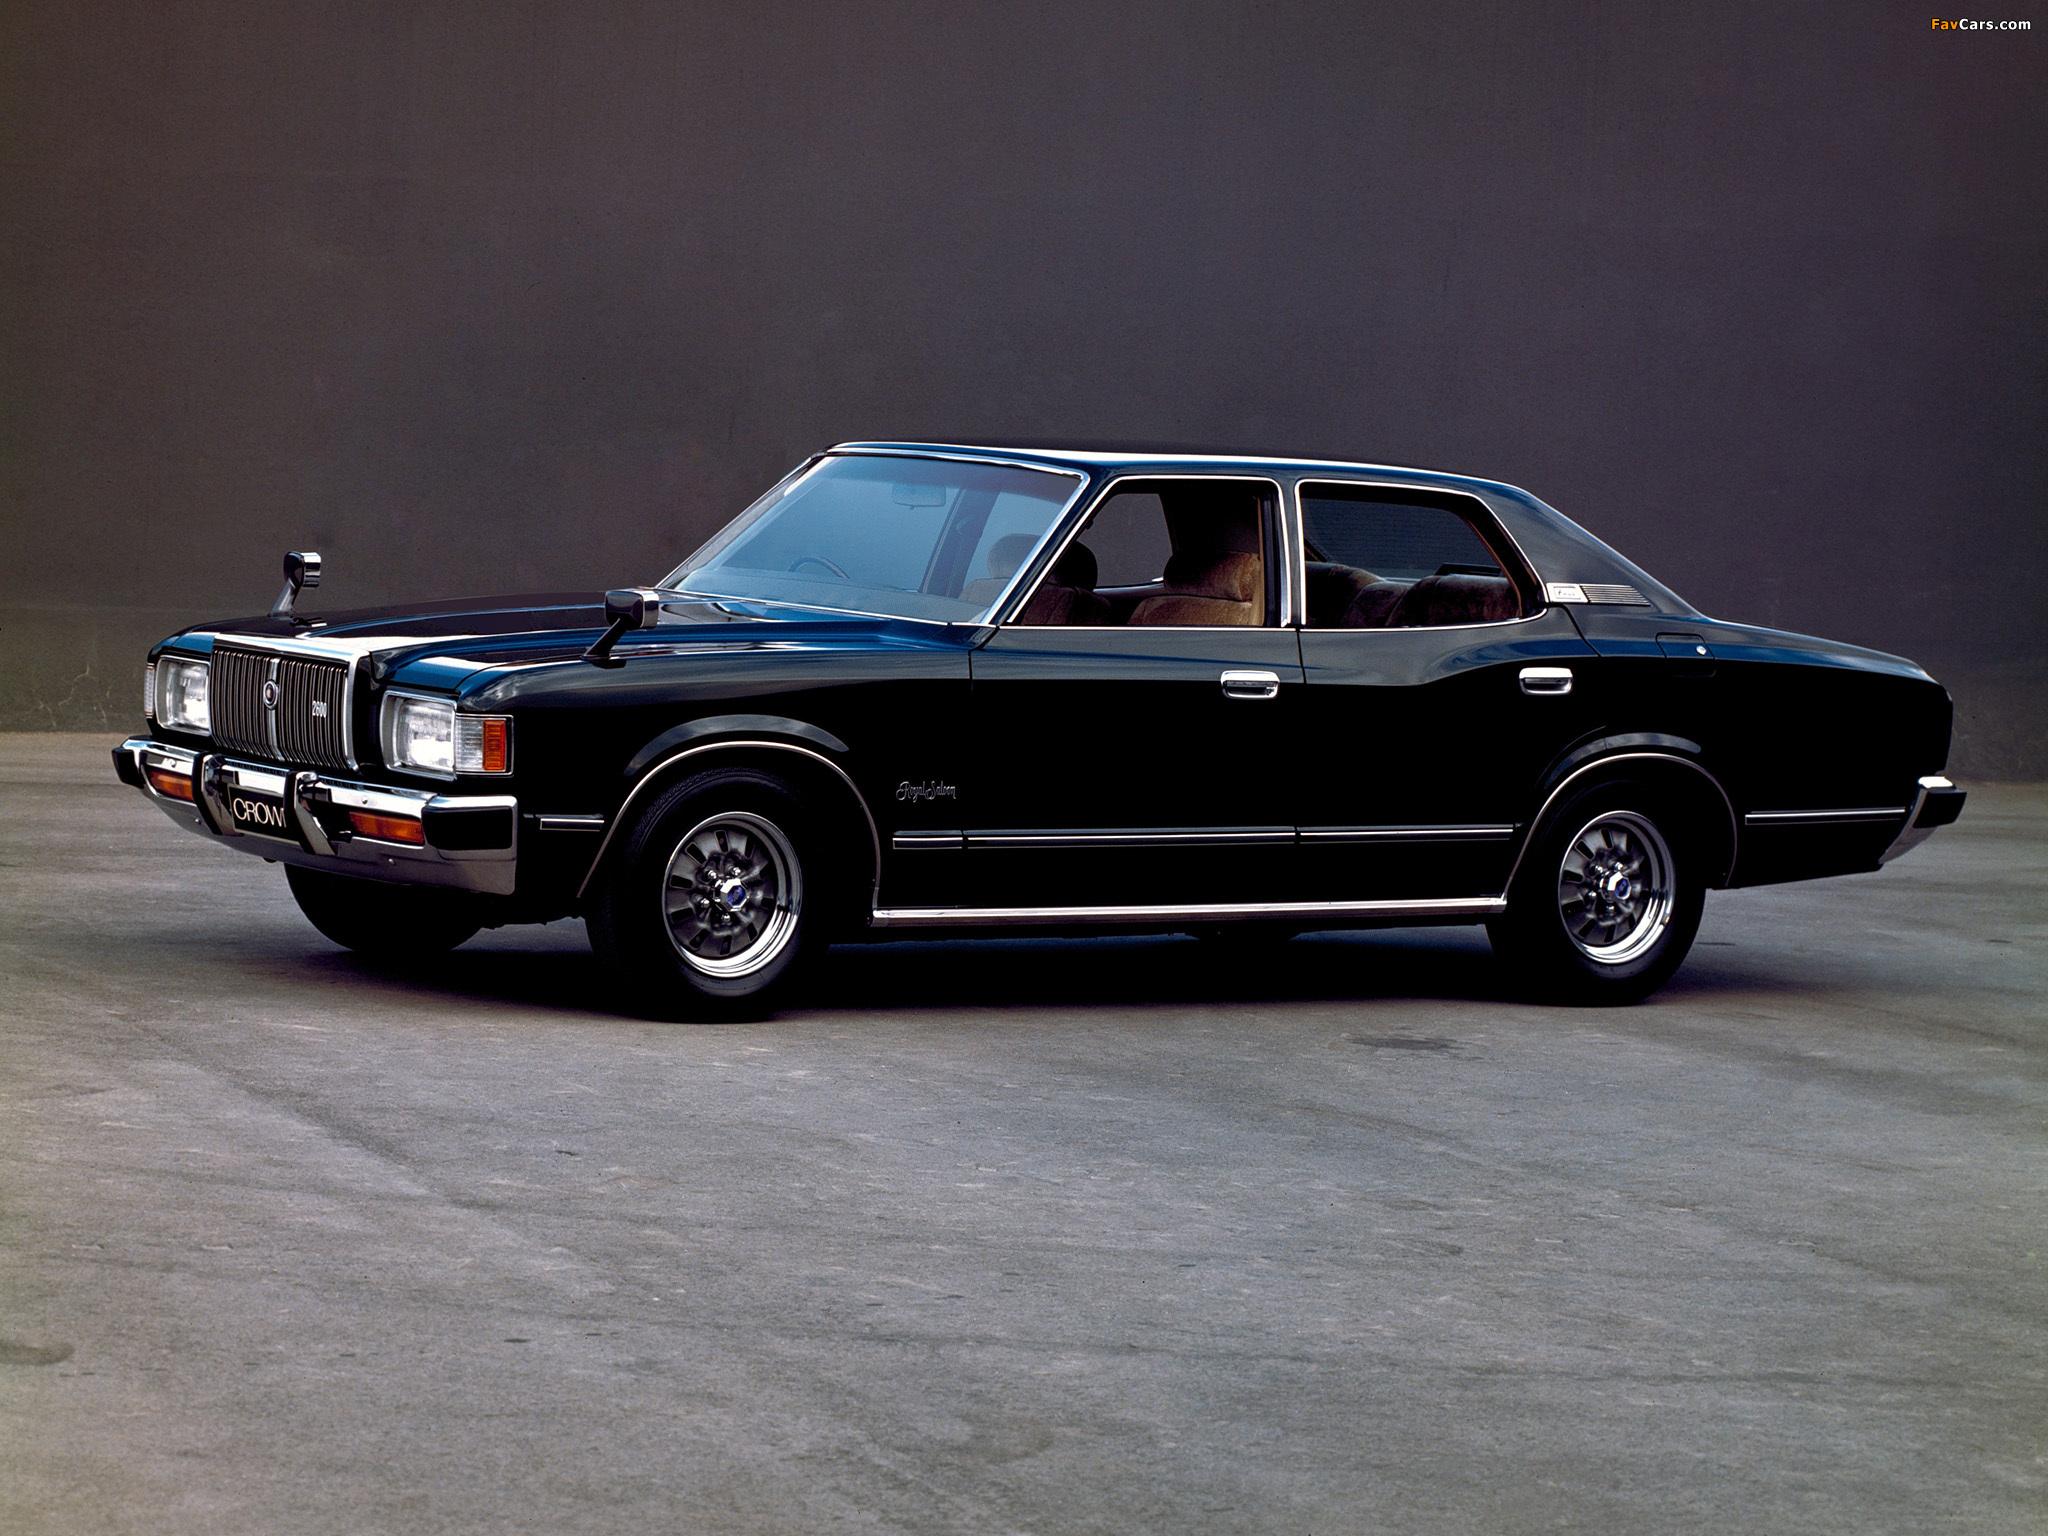 Photos Of Toyota Crown Hardtop S80 1974 79 2048x1536